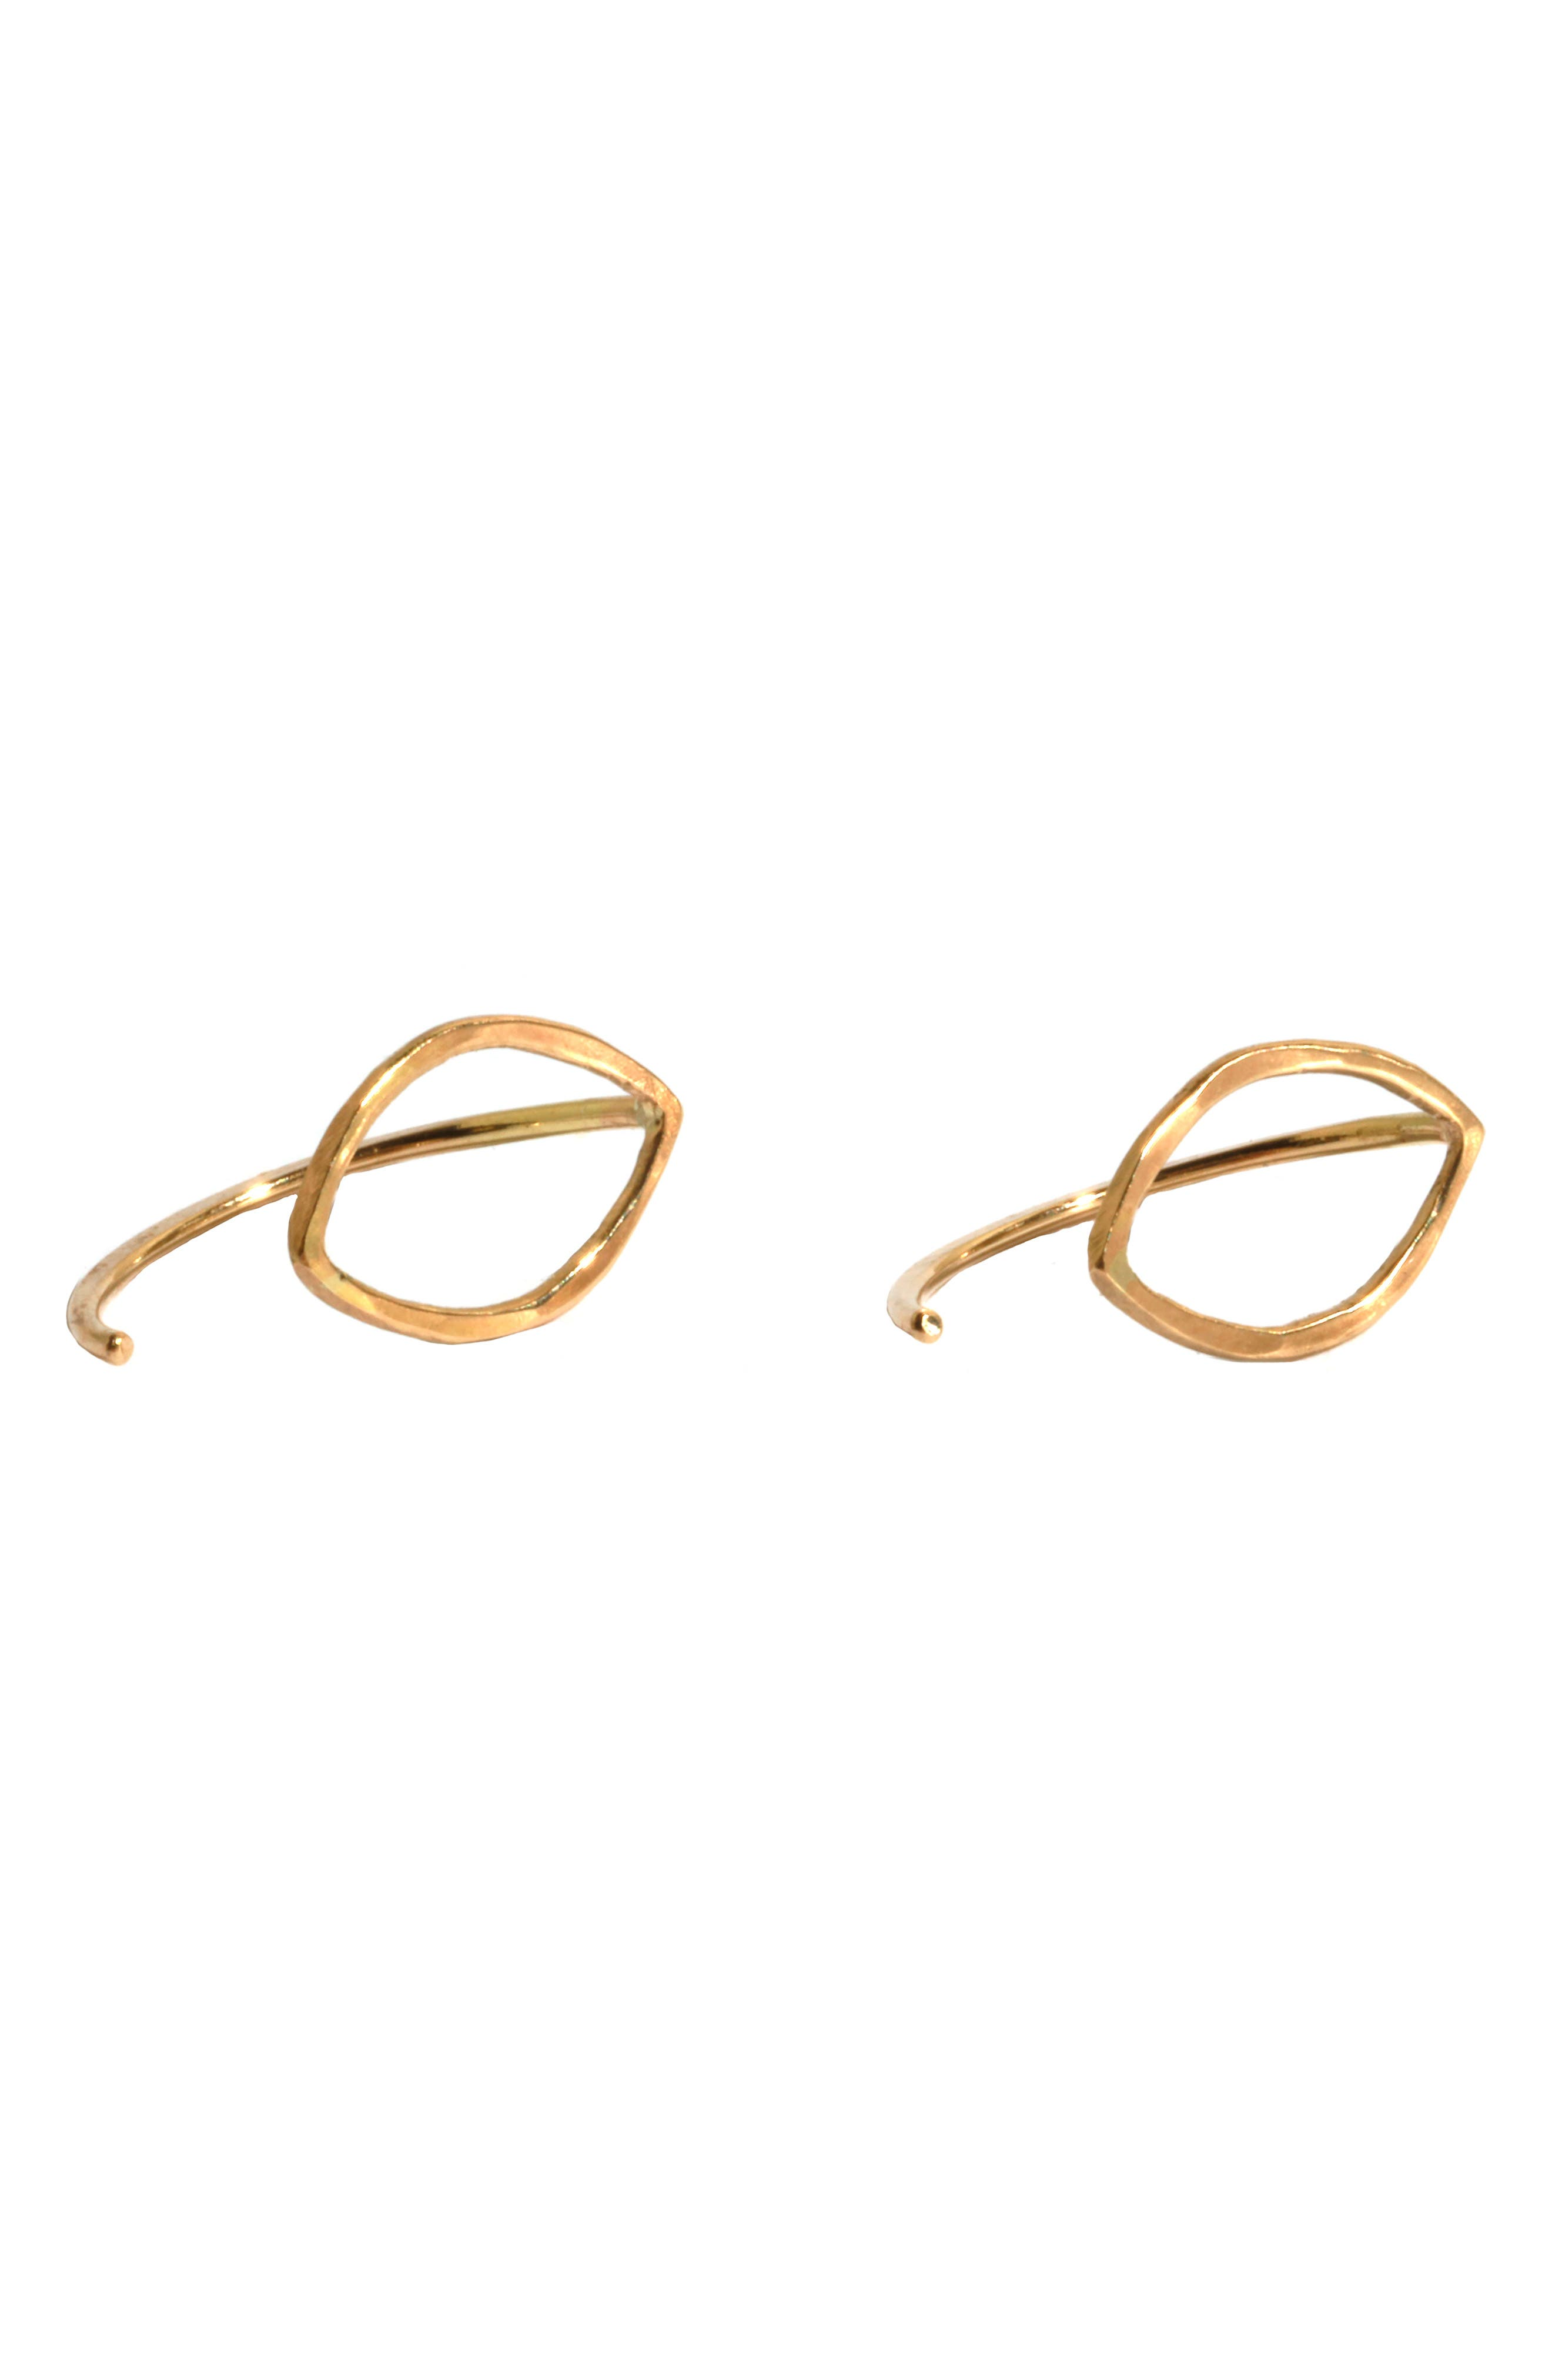 Melissa Joy Manning Small Oval Threader Stud Earrings